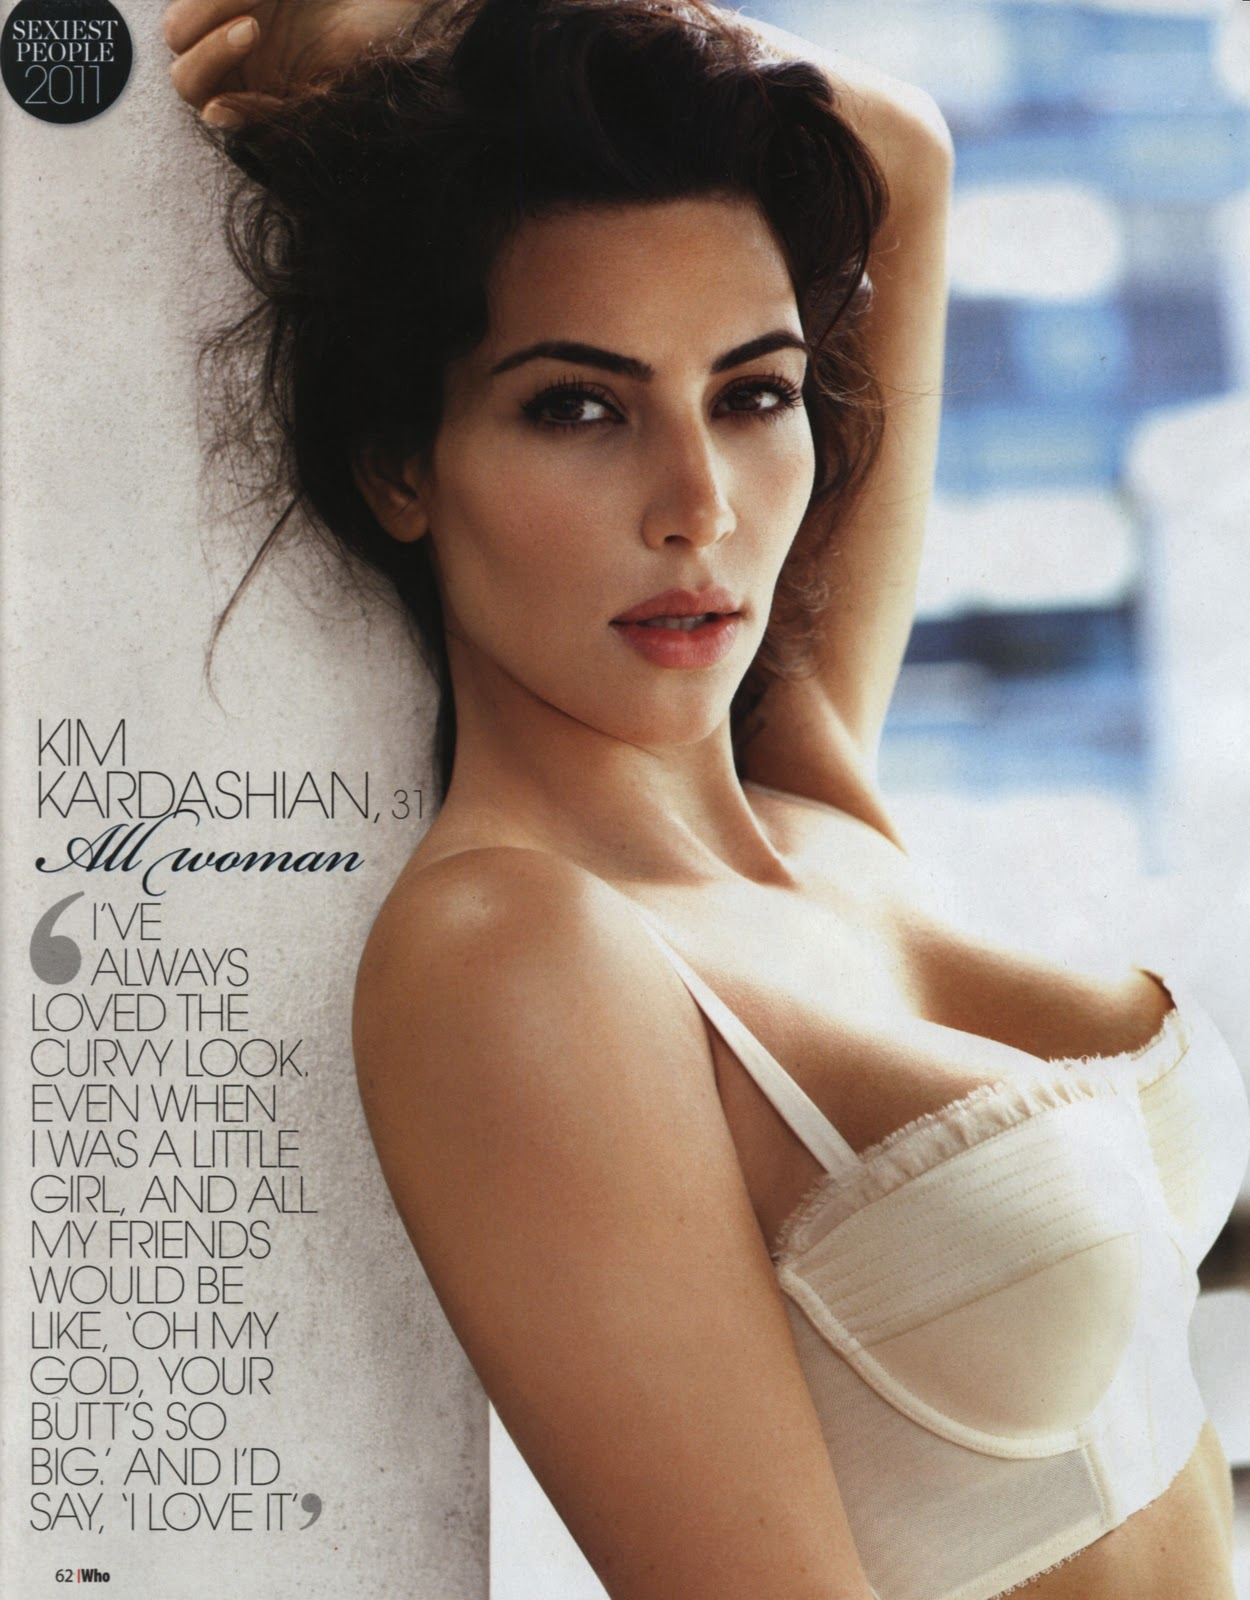 http://3.bp.blogspot.com/-d2KA6rqQ8Pw/TsjOhEGhXQI/AAAAAAAAE6c/fALwOfAeB38/s1600/Kim_Kardashian_Who_Magazine_Australia_Sexiest_People_Issue_2011_001.jpg